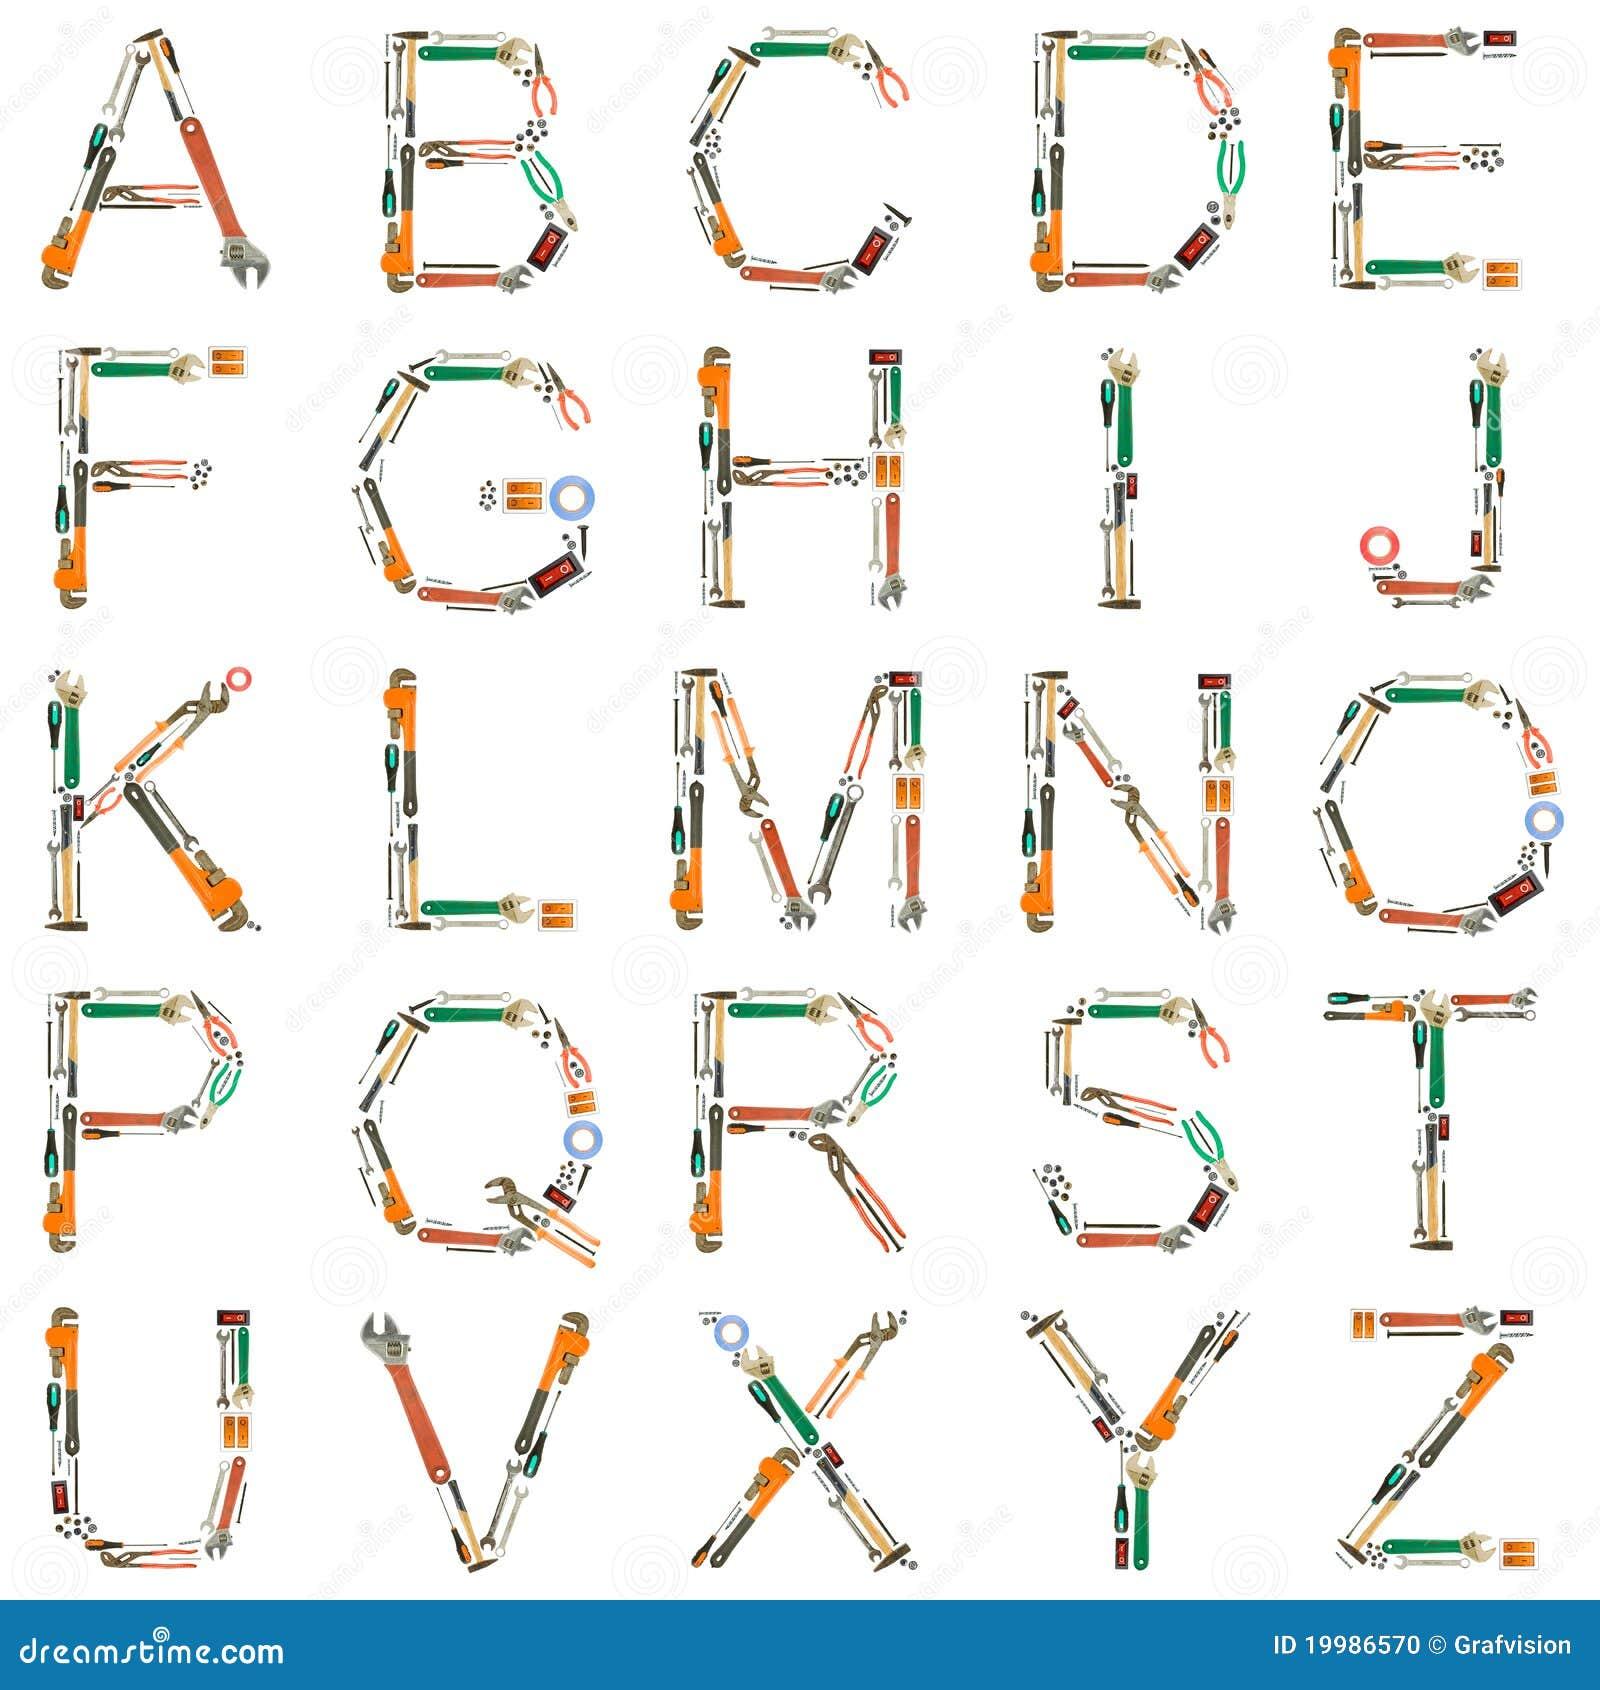 tools alphabet stock photo image of screwdriver tapeline 19986570